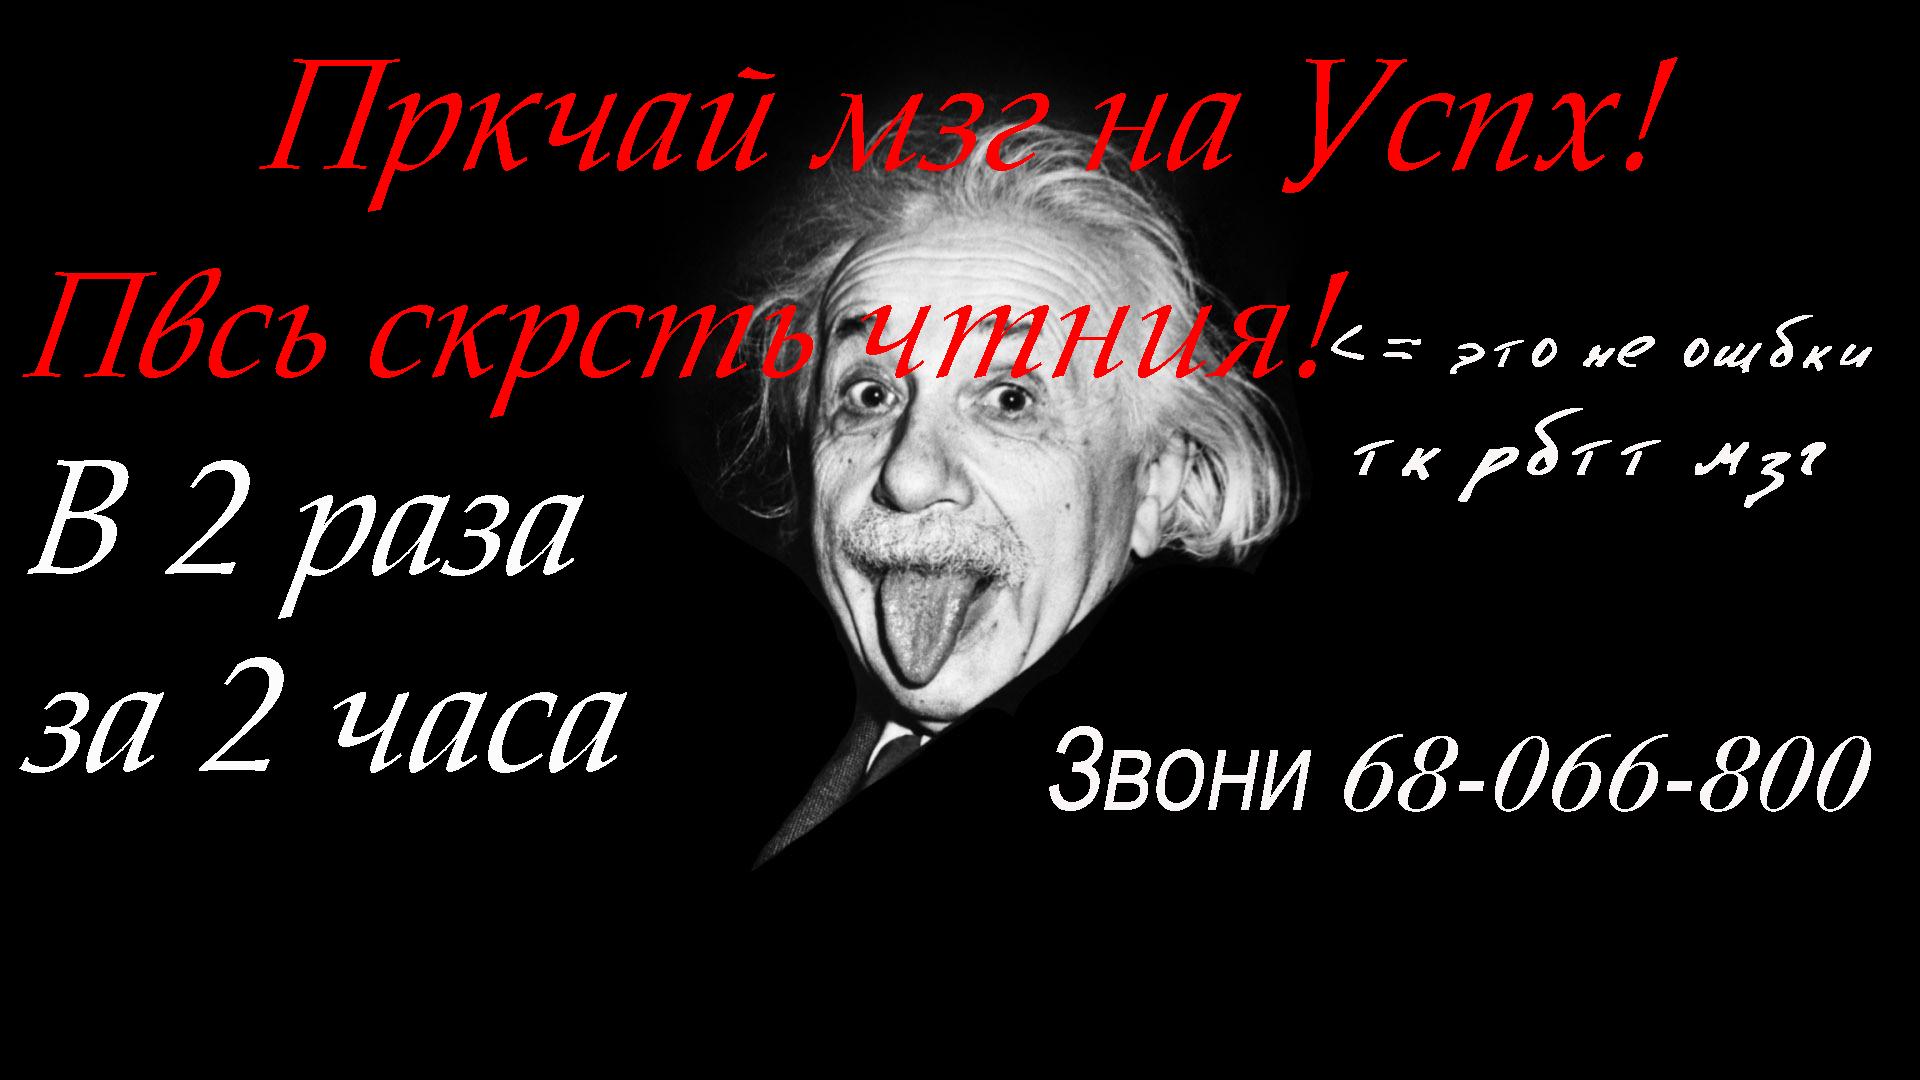 Эйнштейн X-treem reading.Увеличение скорости чтения в 2 раза за 2 часа